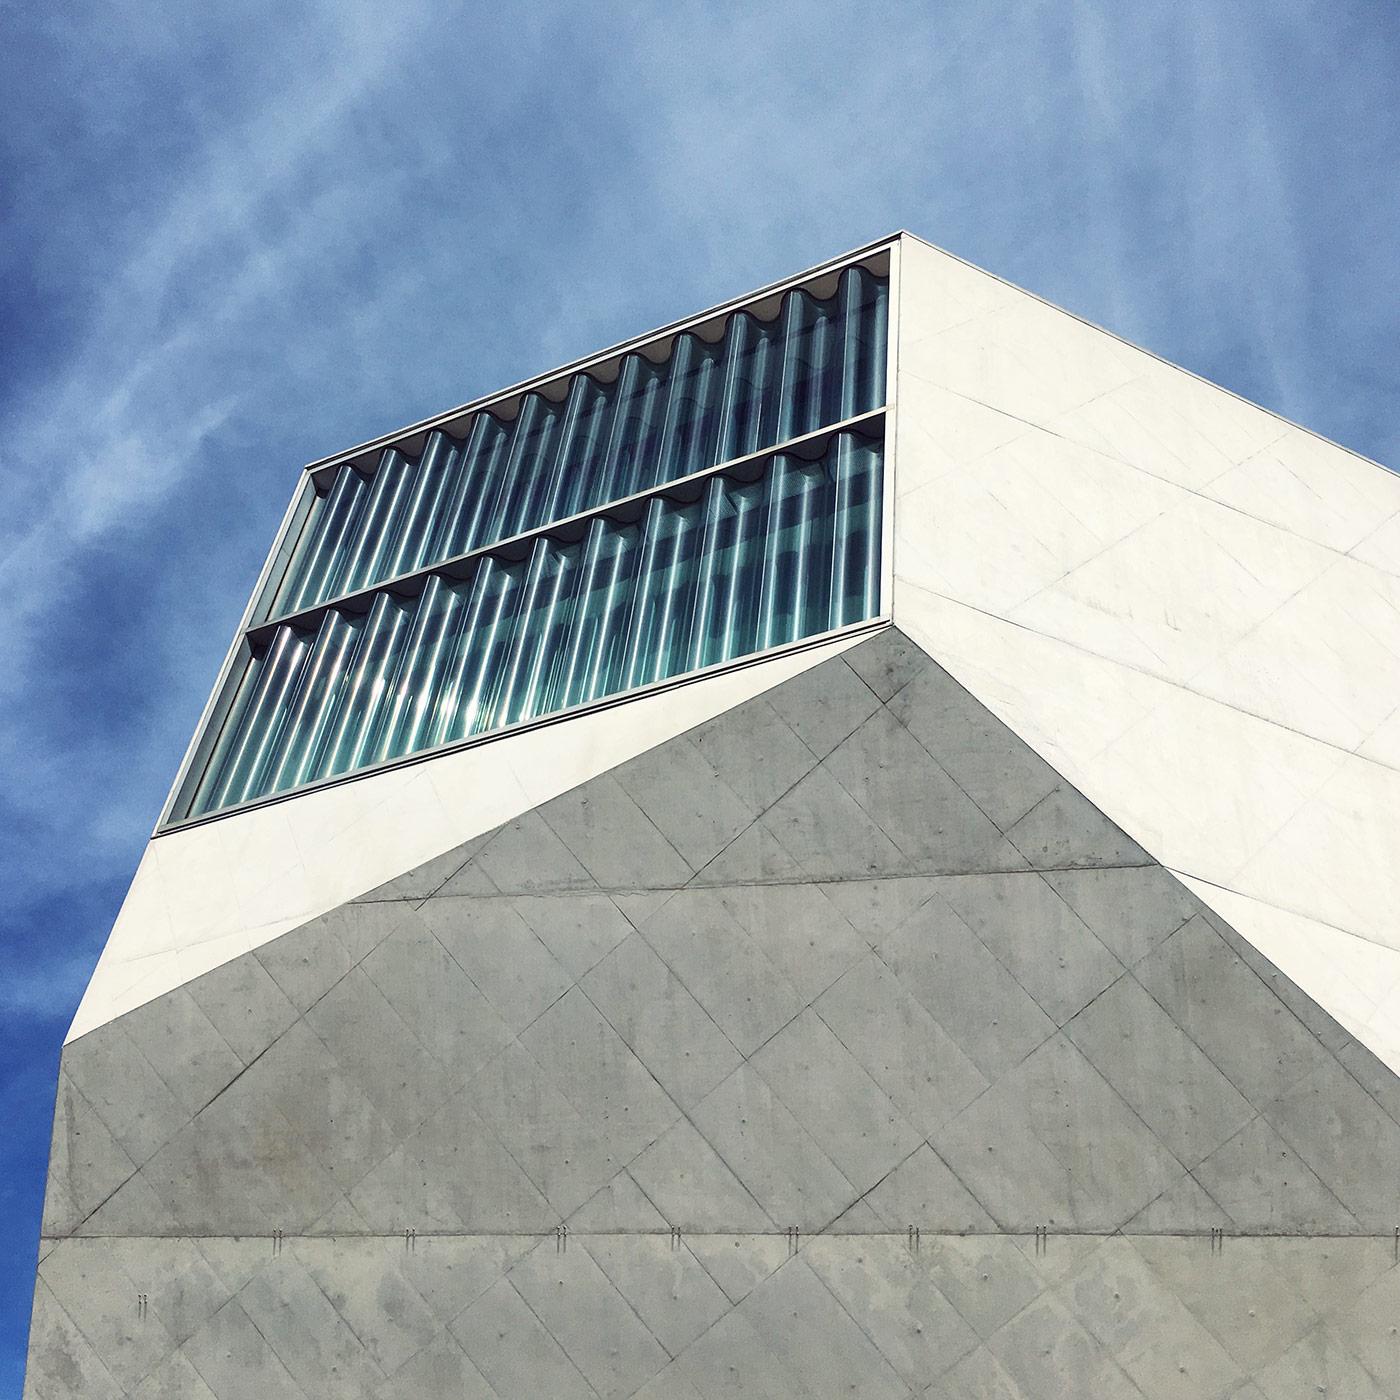 Casa da Música <br />Location: Porto, Portugal <br />Architects: OMA (Rem Koolhaas & Ellen Van Loon)